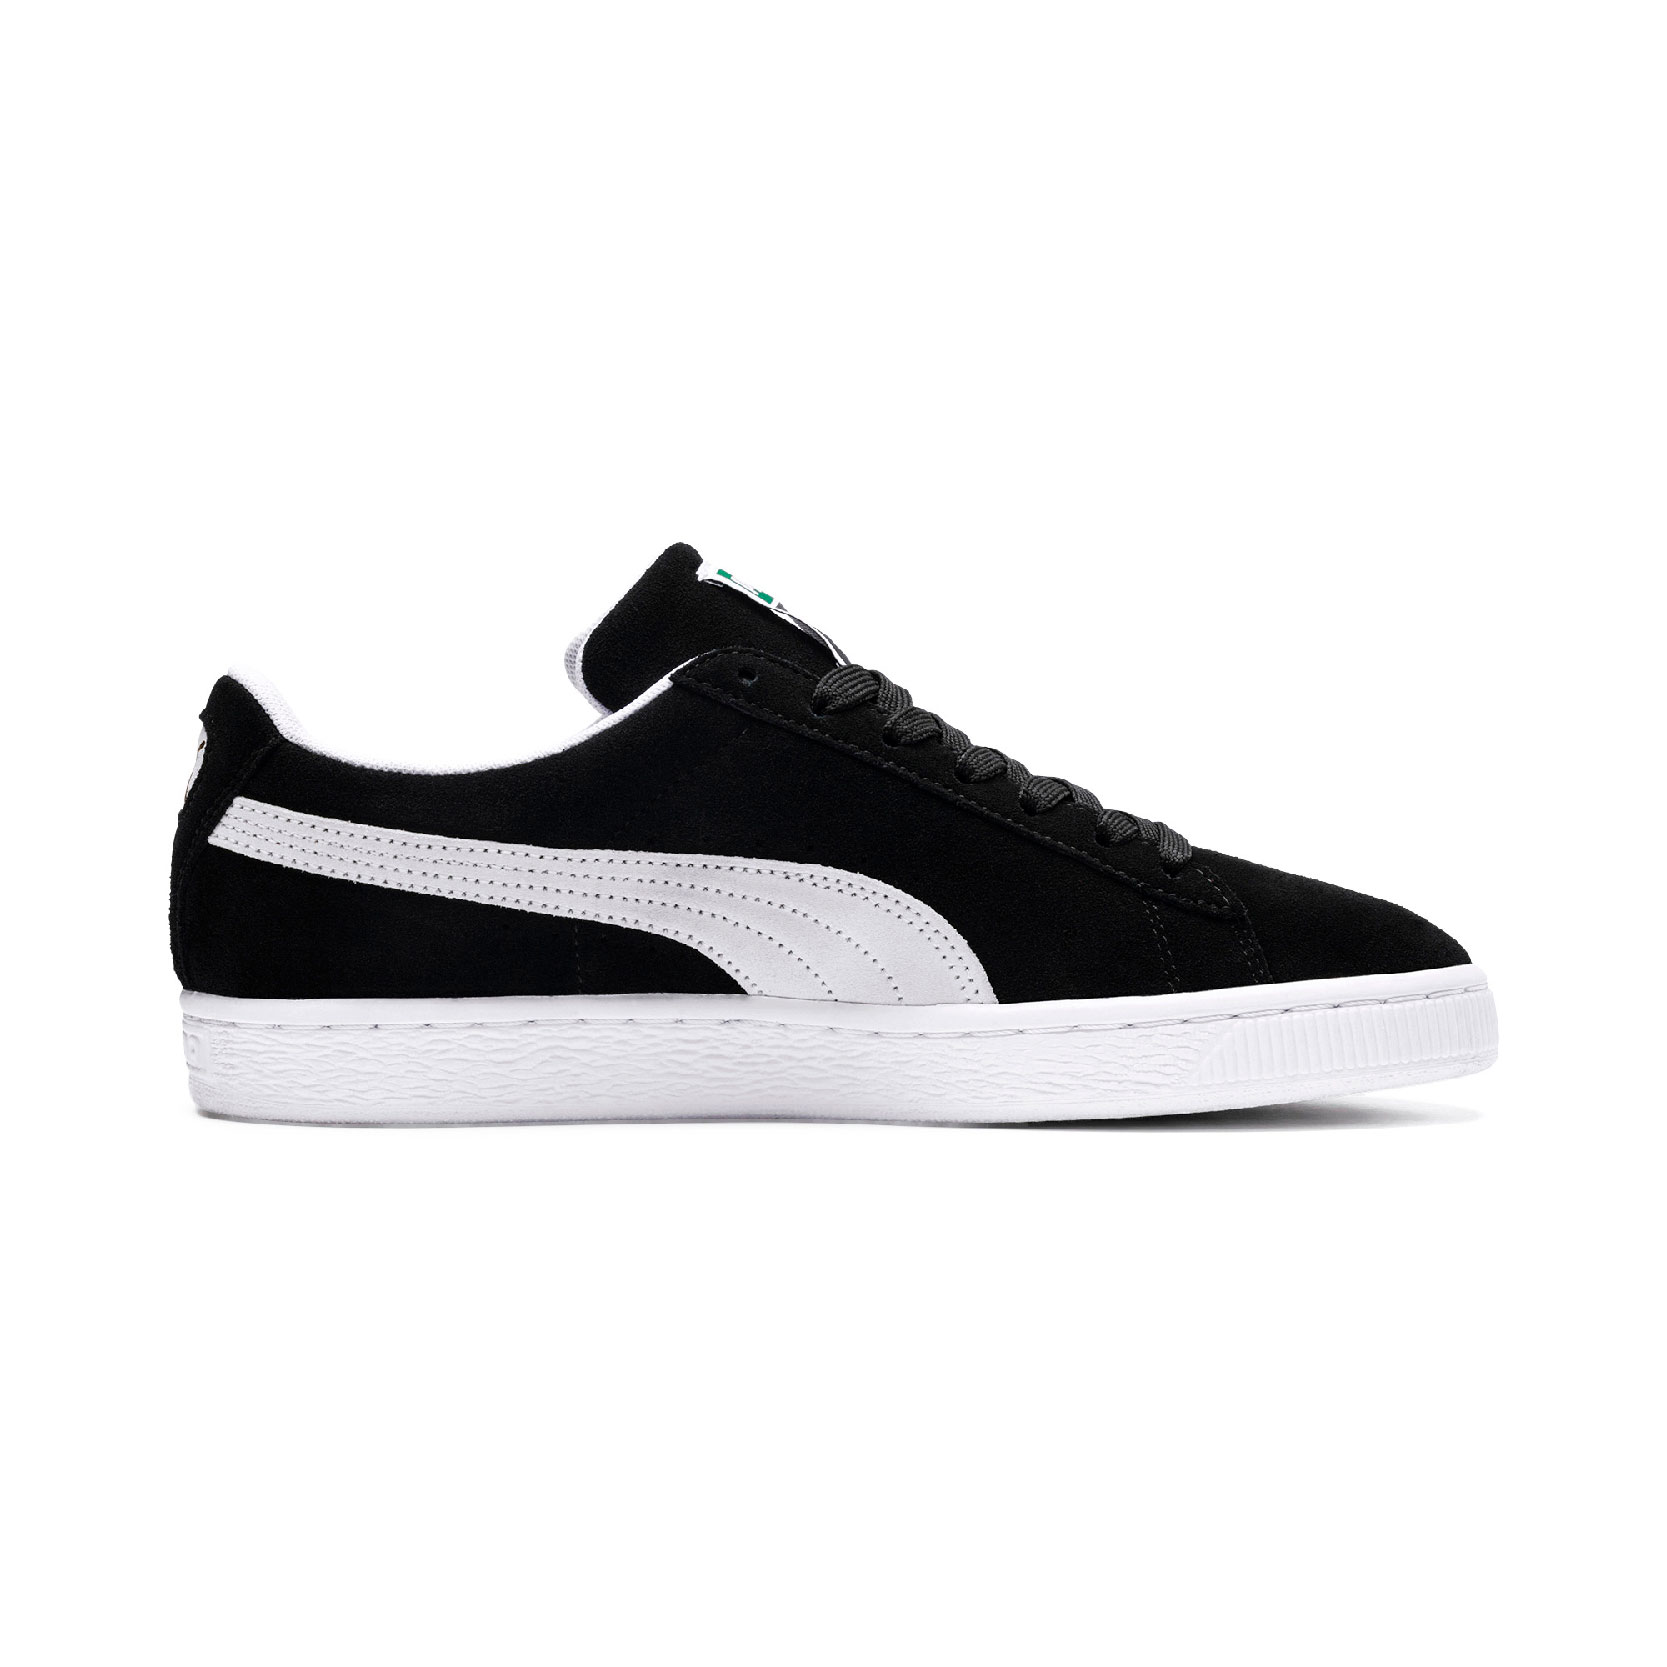 Puma Men's Suede Classic+ Sneakers 352634-03